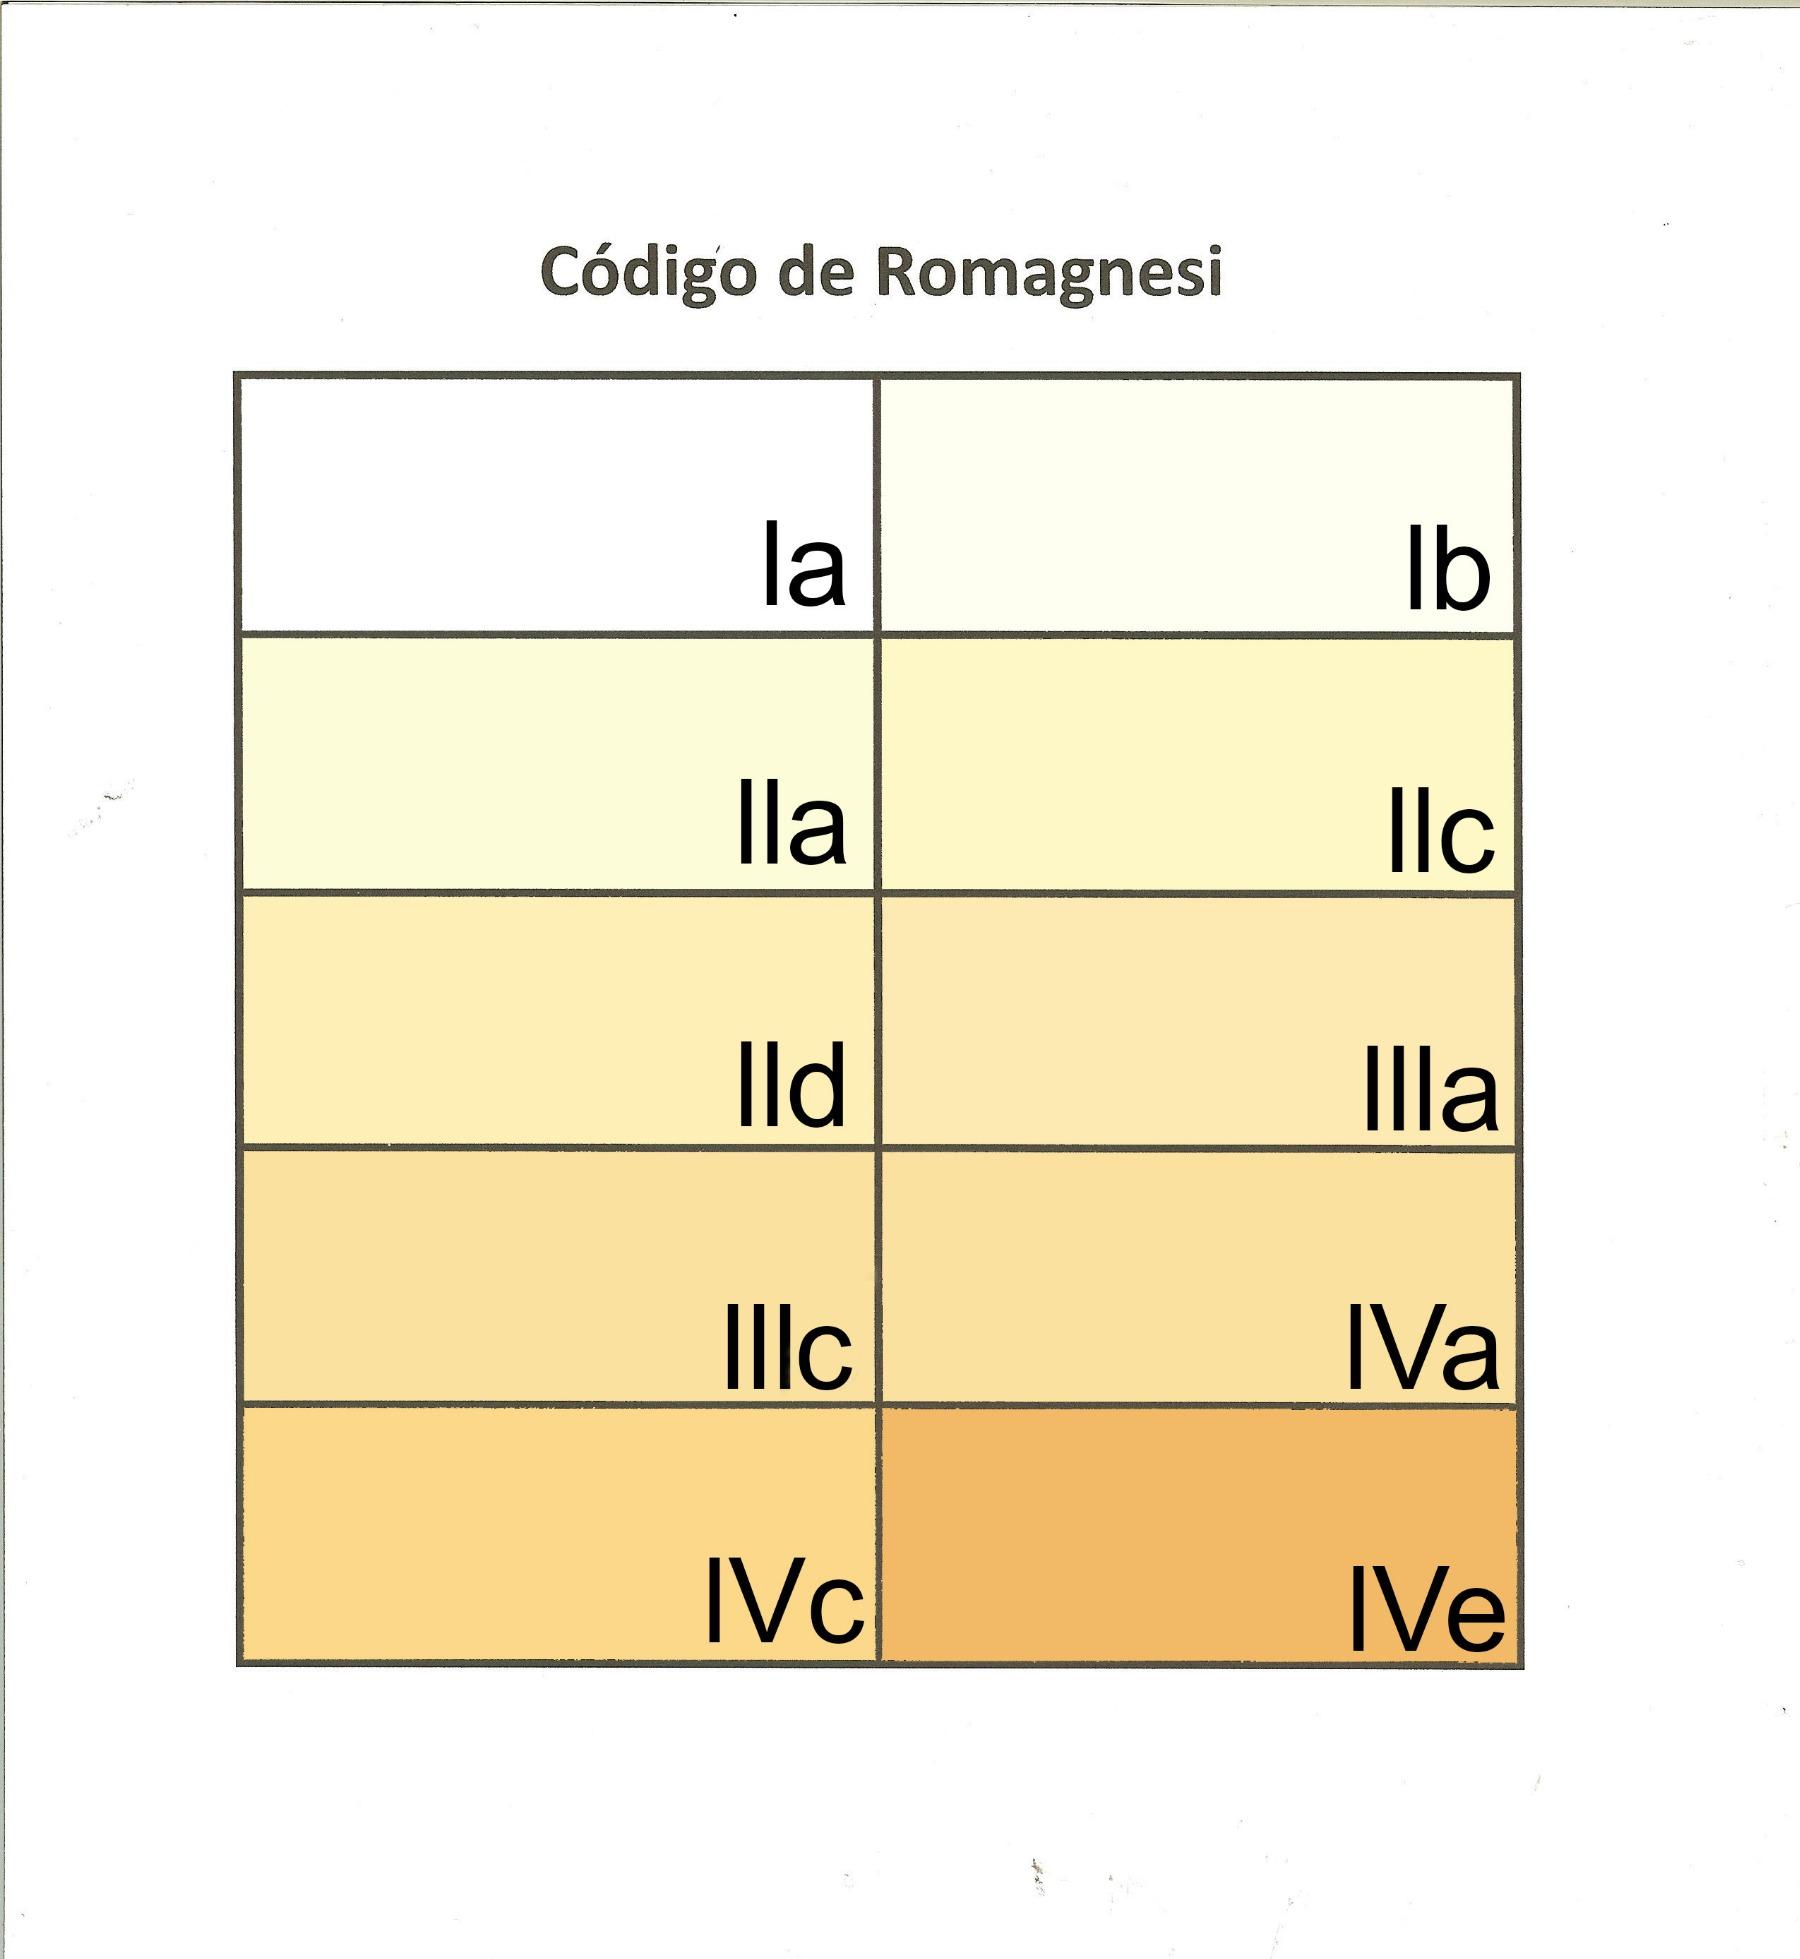 CdigodeRomagnesi.jpg